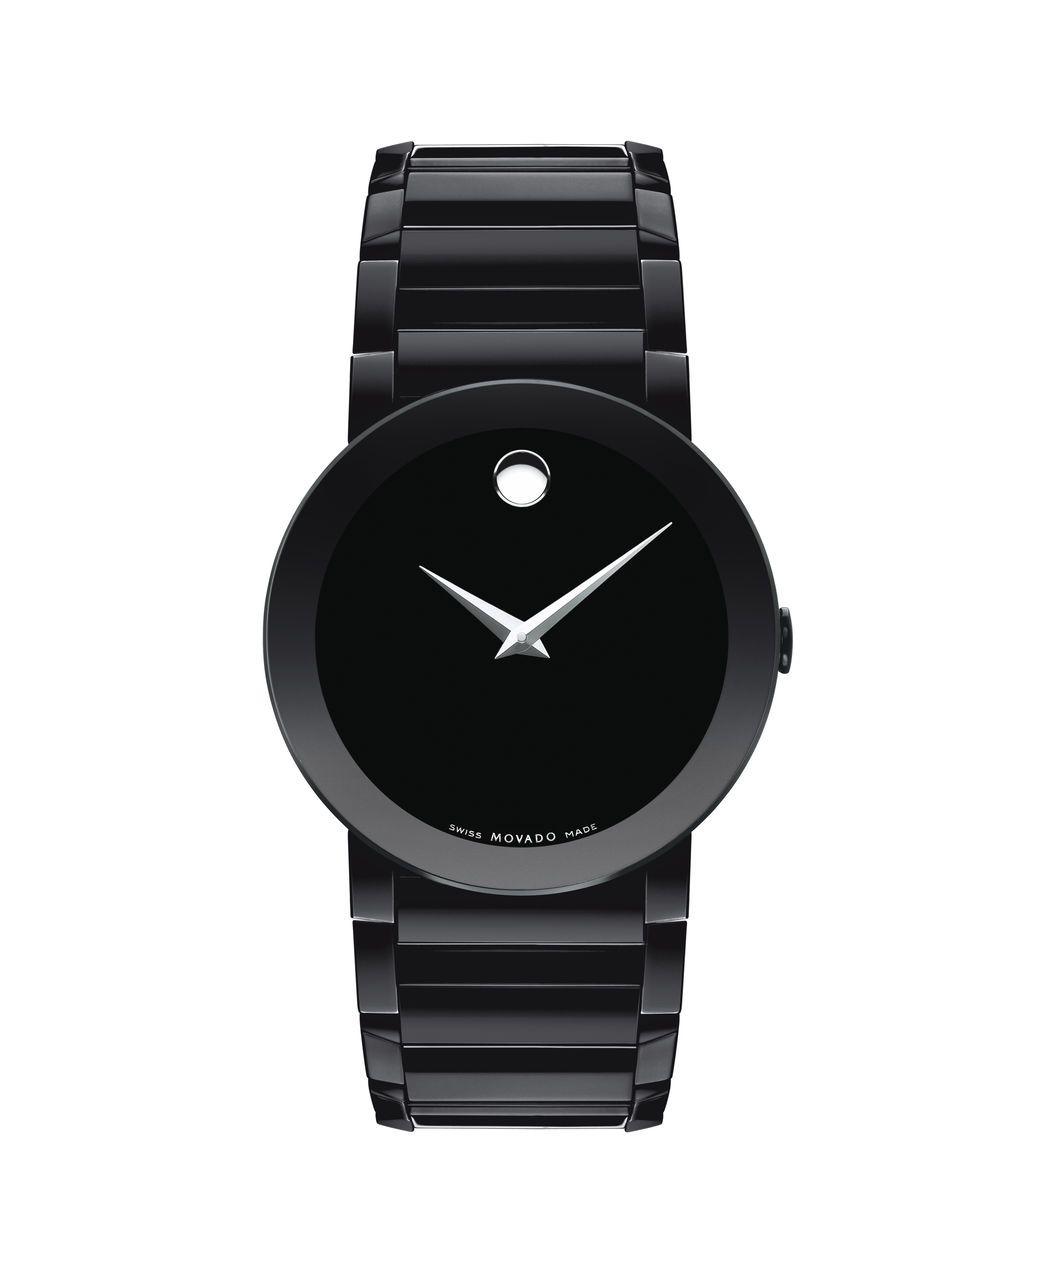 a0ff191dc0e5 Men s Sapphire watch